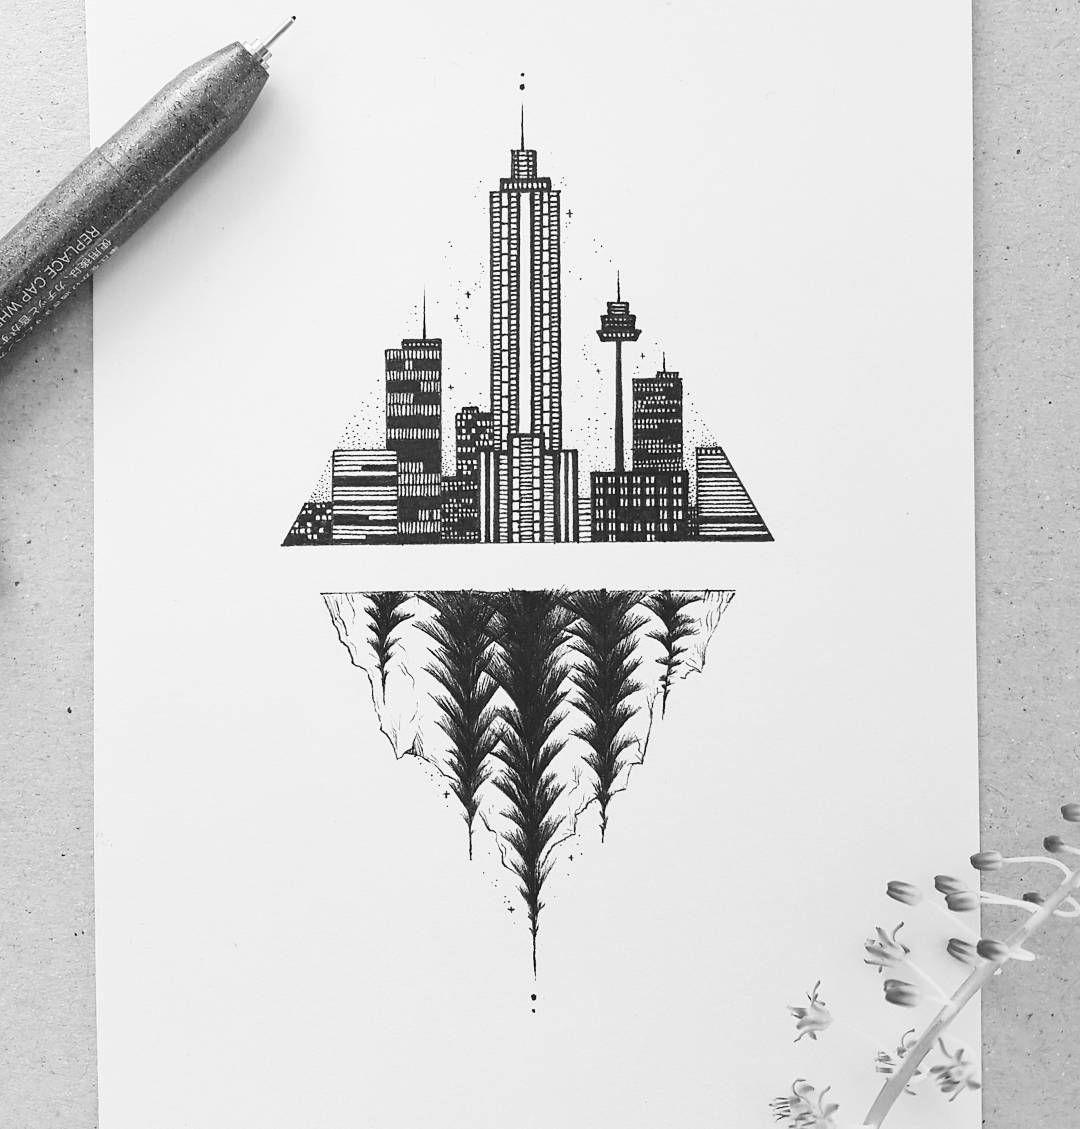 Monday Sketch Blackwork Illustration Dotwork Handdrawn Instaart Creative Ink Tattoodesign Urban Line Art Drawings Art Drawings Pencil Art Drawings